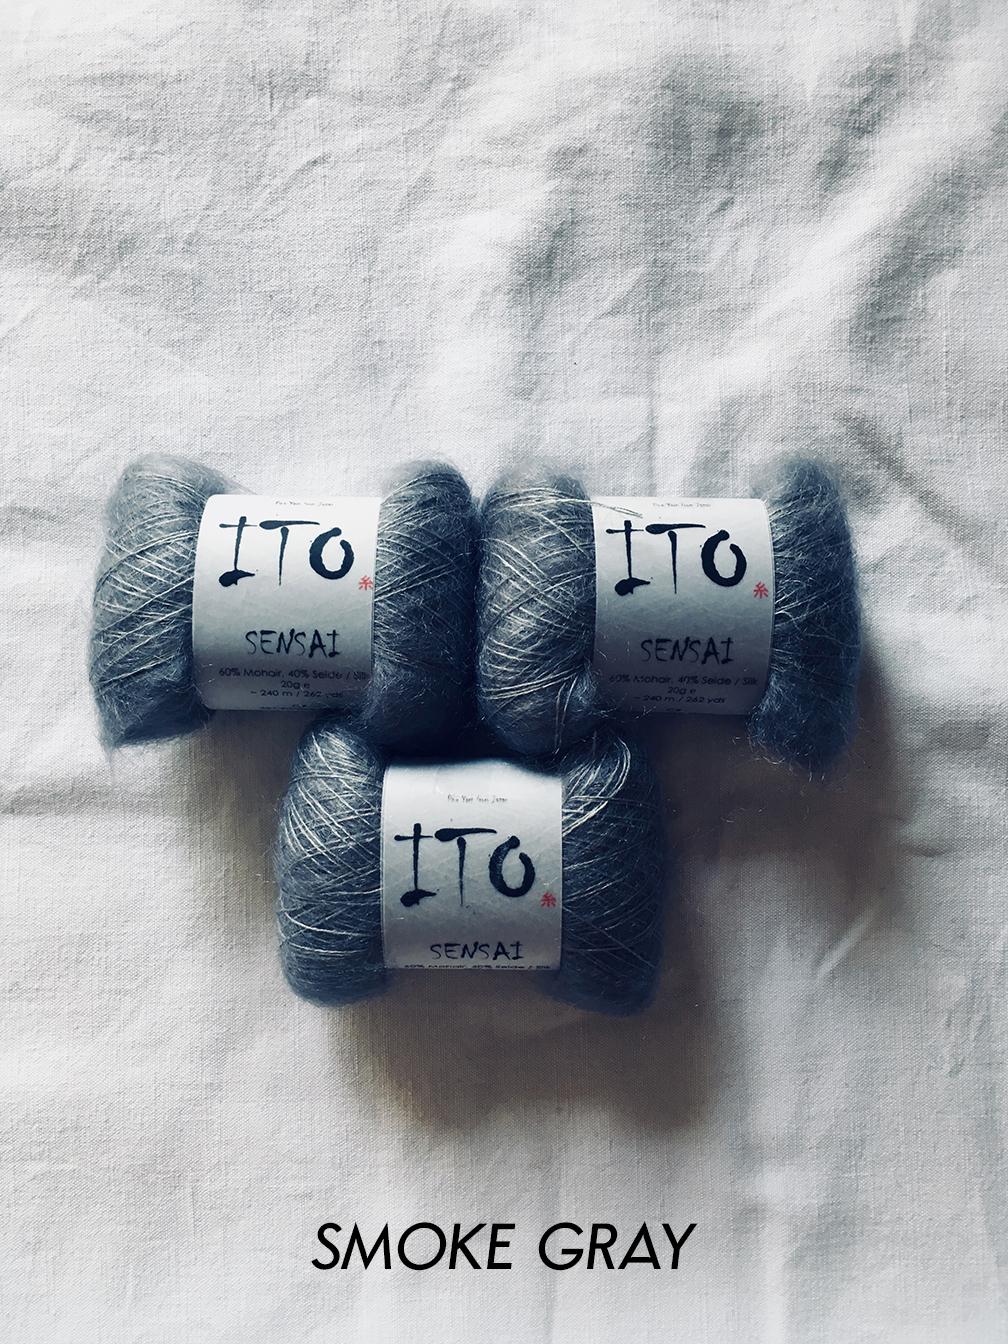 ito_sensai_smoke_gray_321_wool_done_knitting.jpg